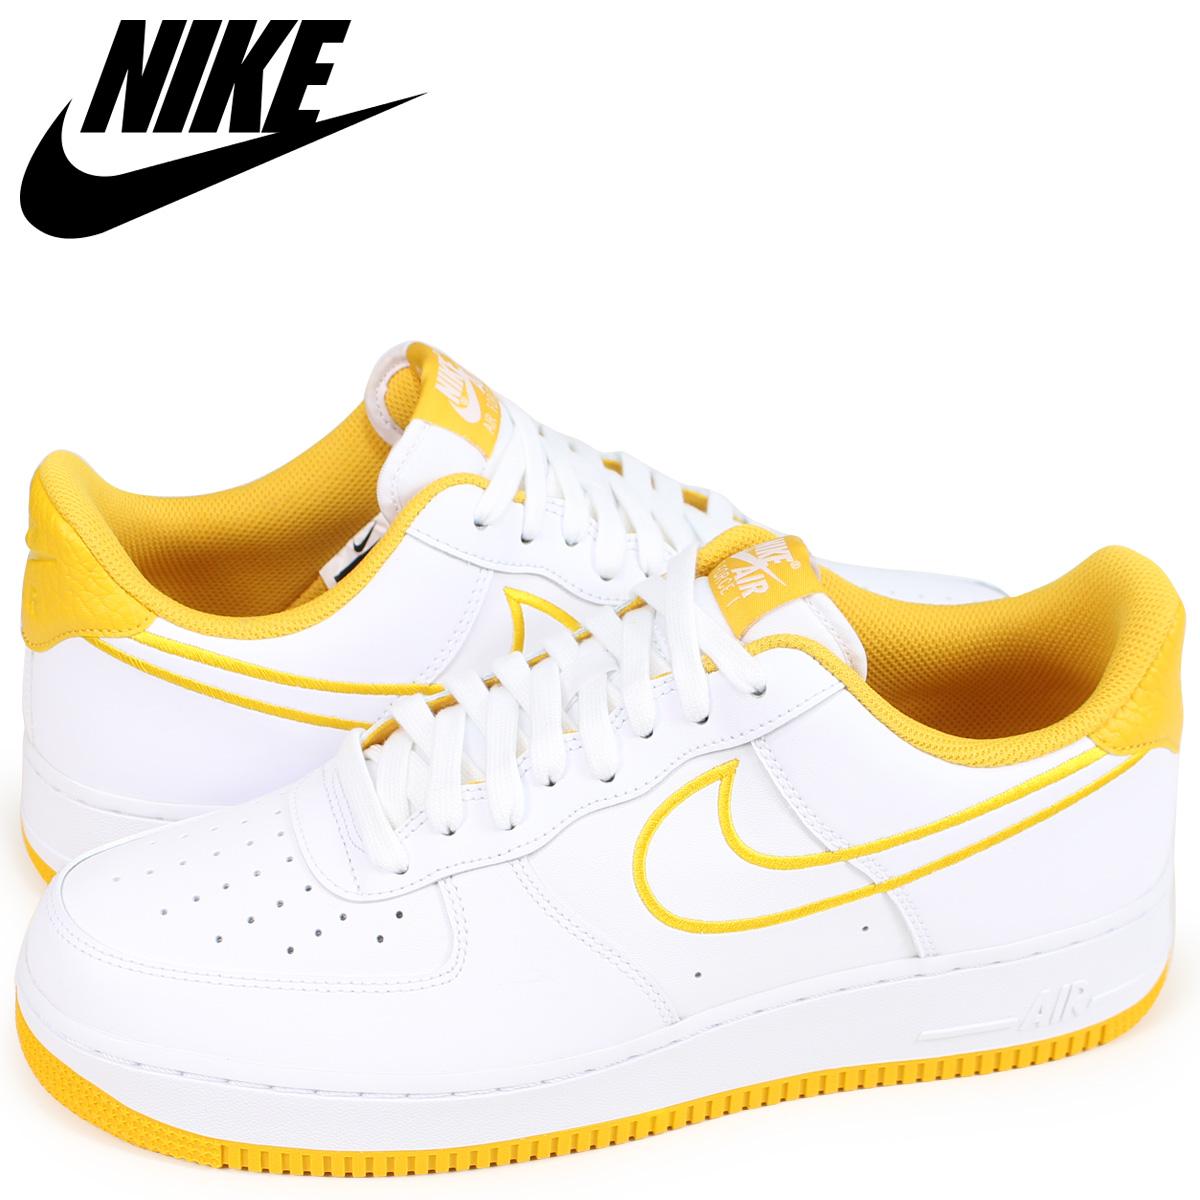 Nike Air Force 1 Low 07 LTHR White Yellow Ochre AJ7280 101